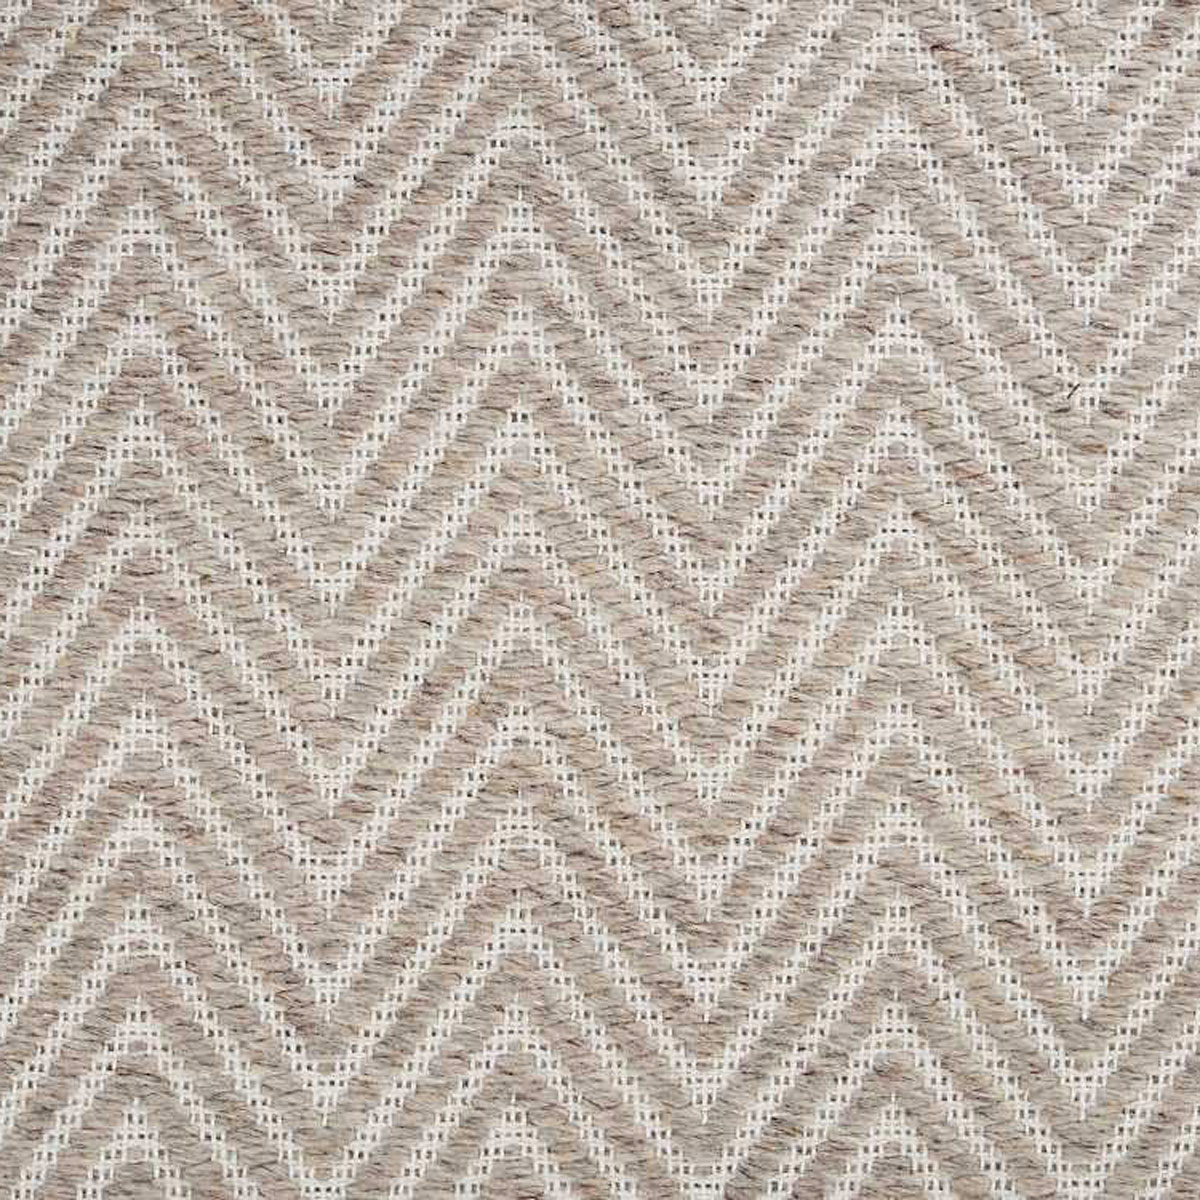 kool-chevron_wool-polyester_broadloom_patterson-flynn-martin_pfm